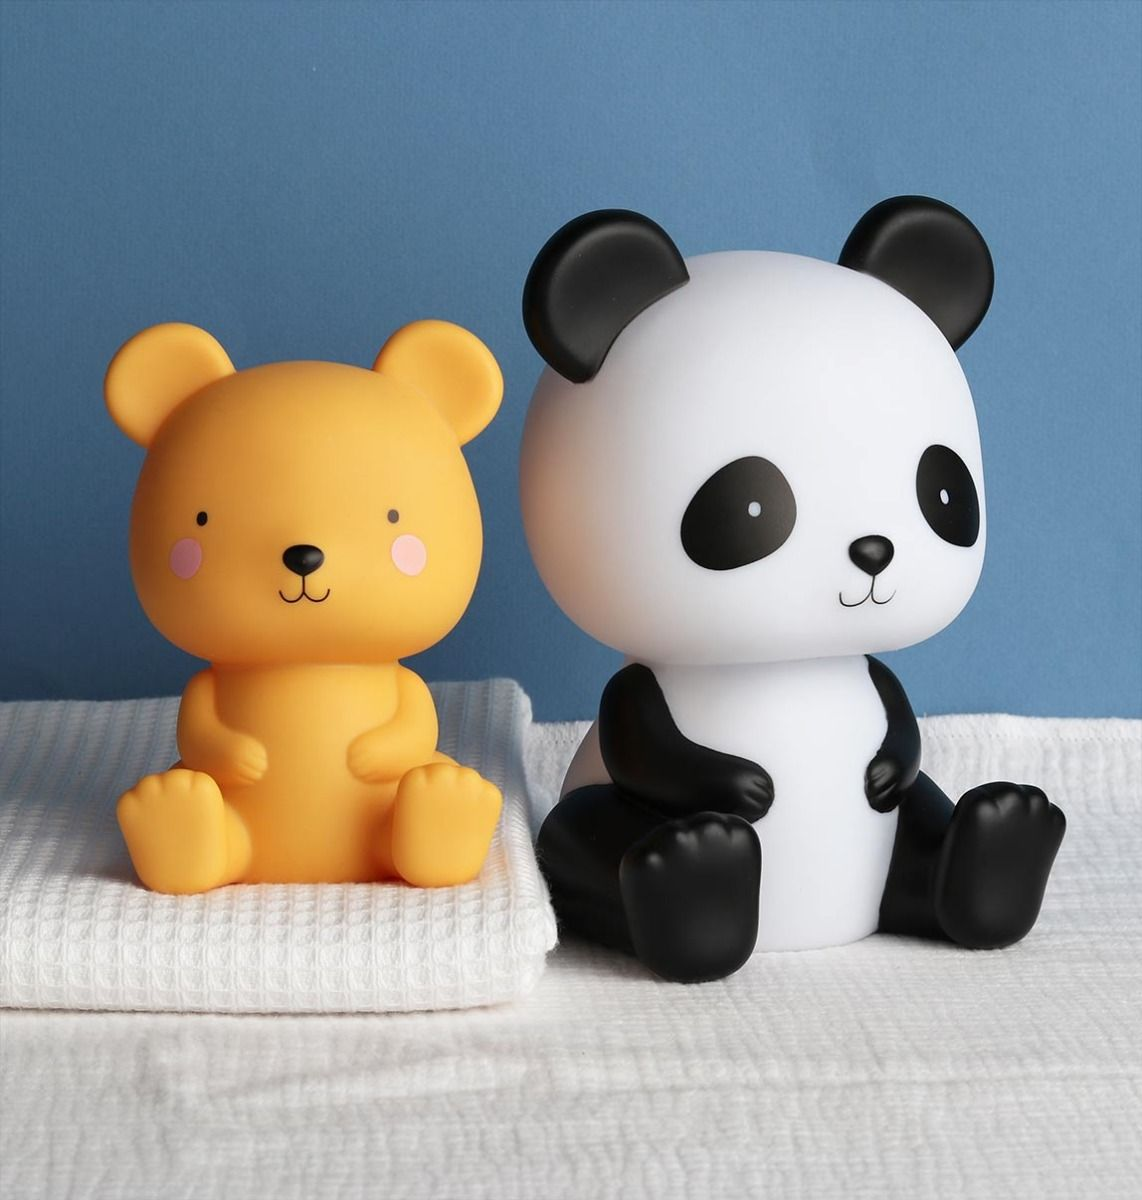 nlpawh01-lr-19-panda-night-light A Little Lovely Company